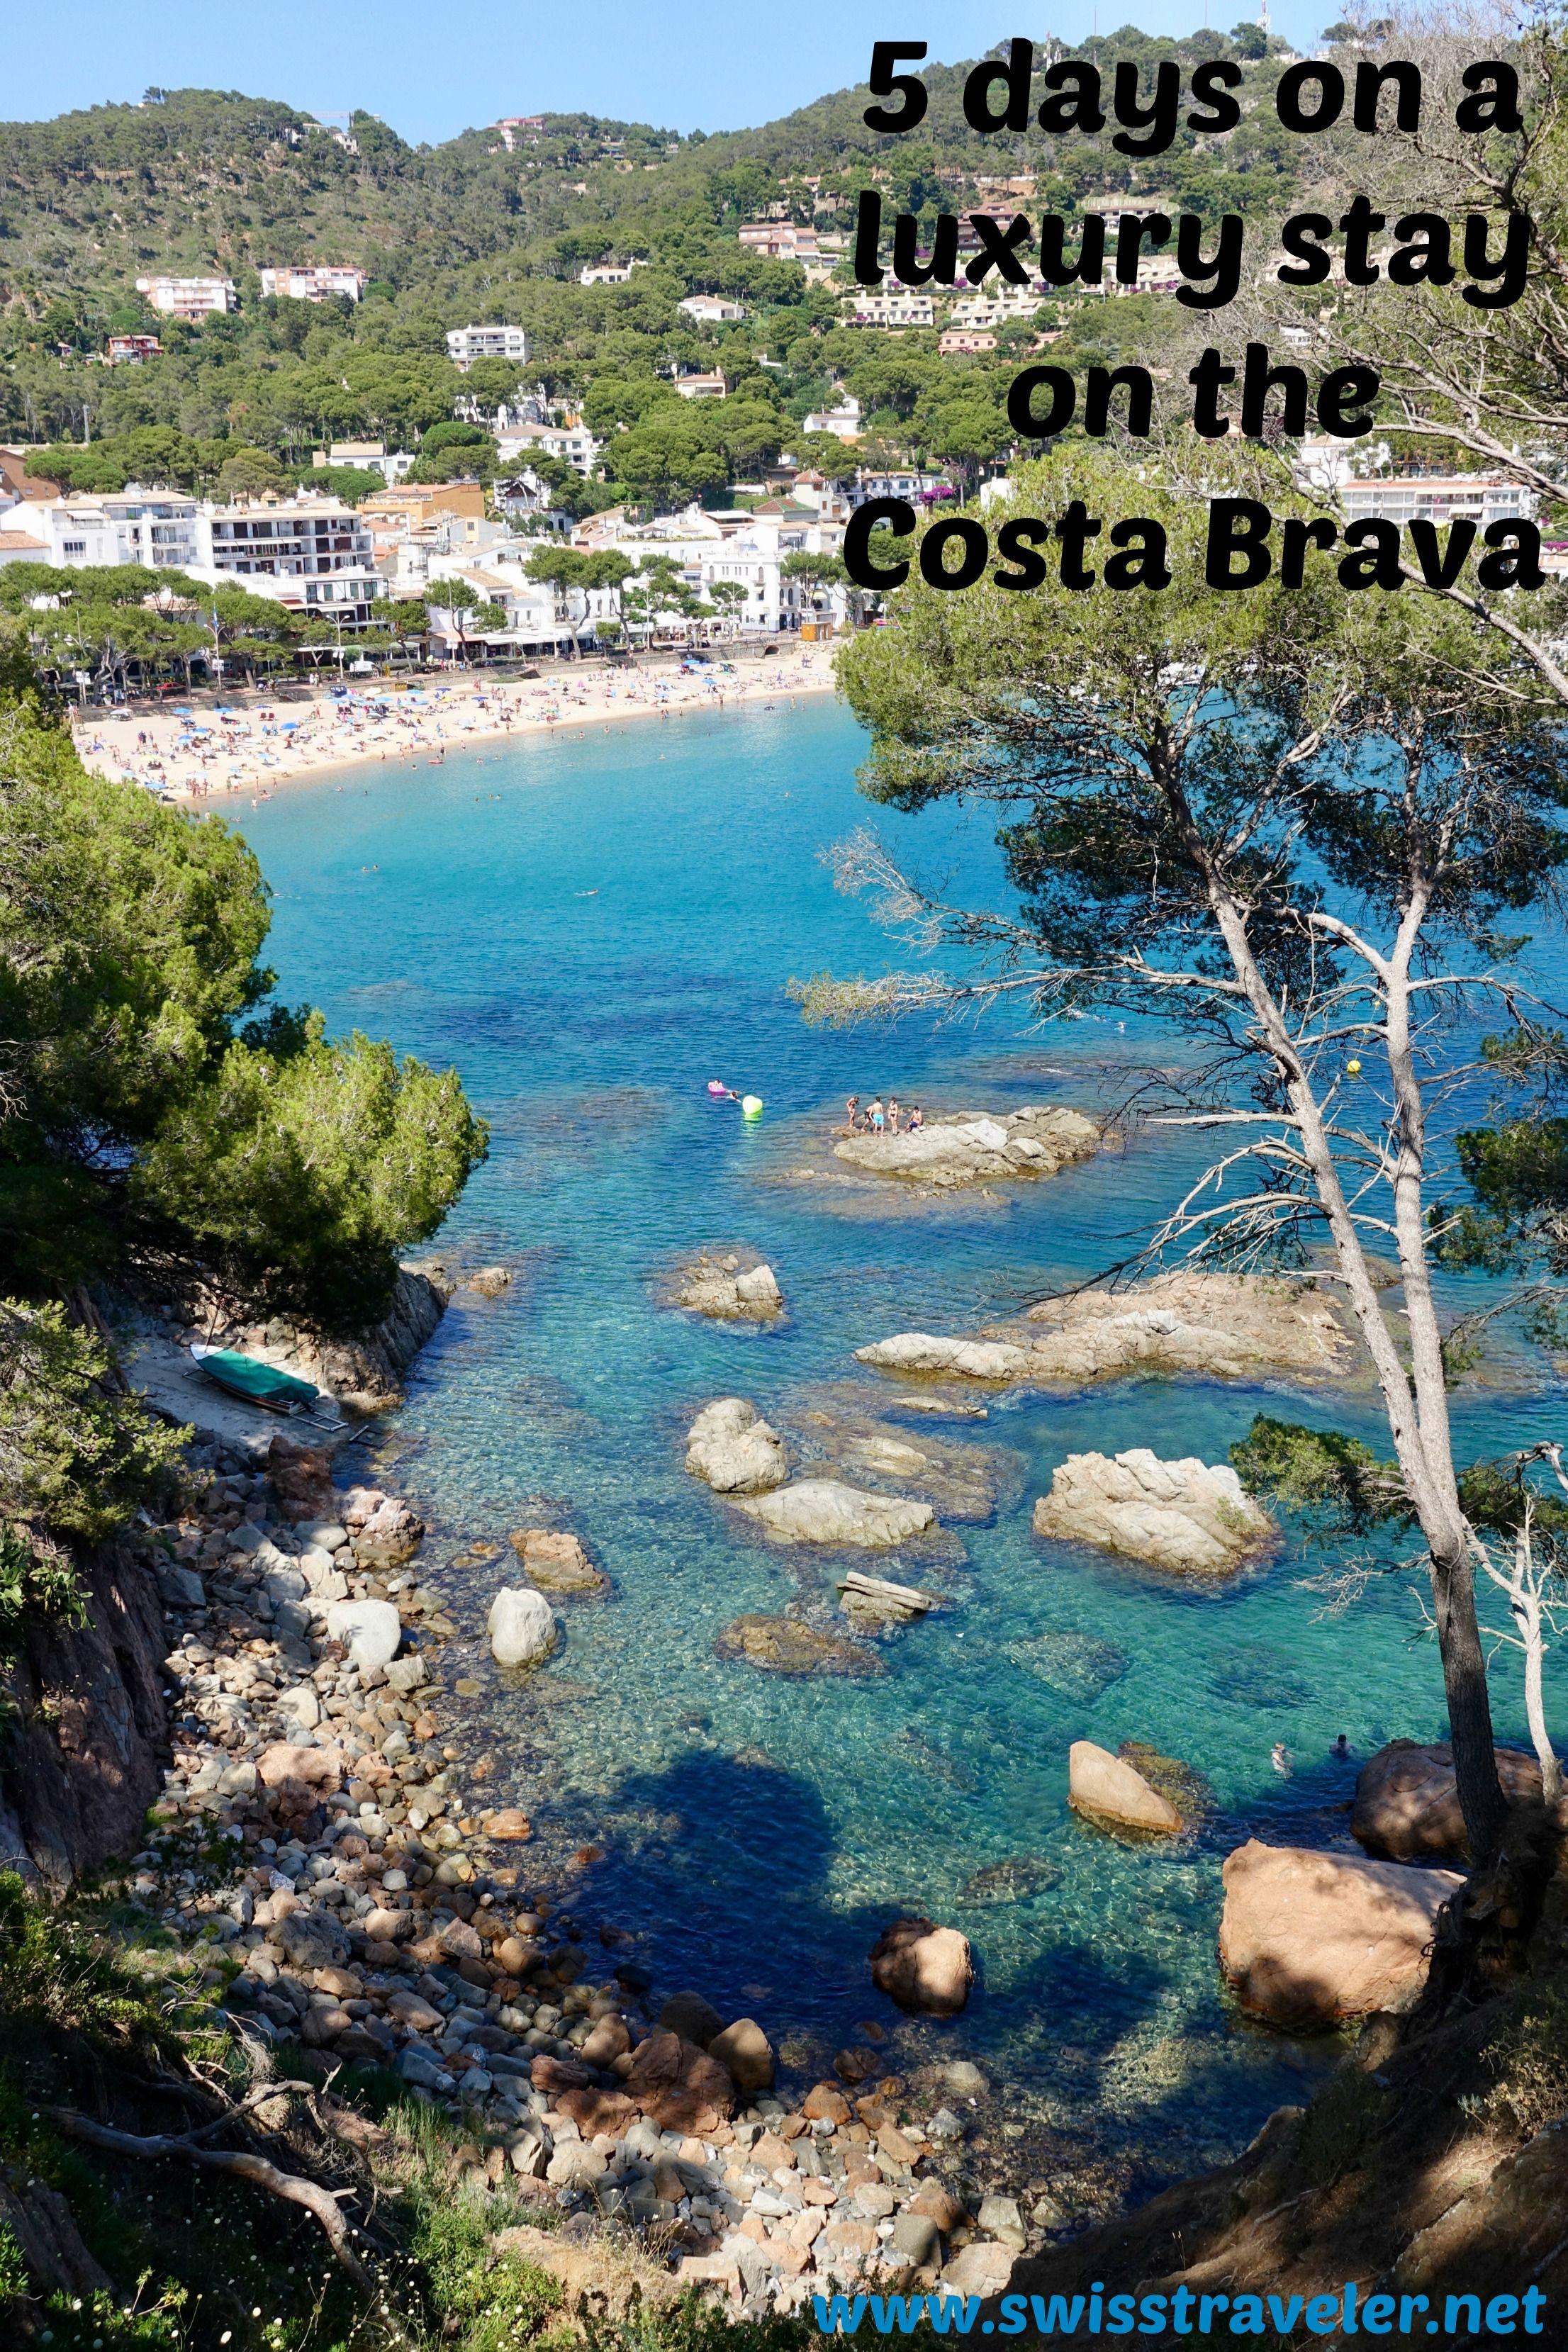 Costa Brava Jewel Of Northern Spain Insanely Beautiful Rugged Coast 1 Amazing Luxury